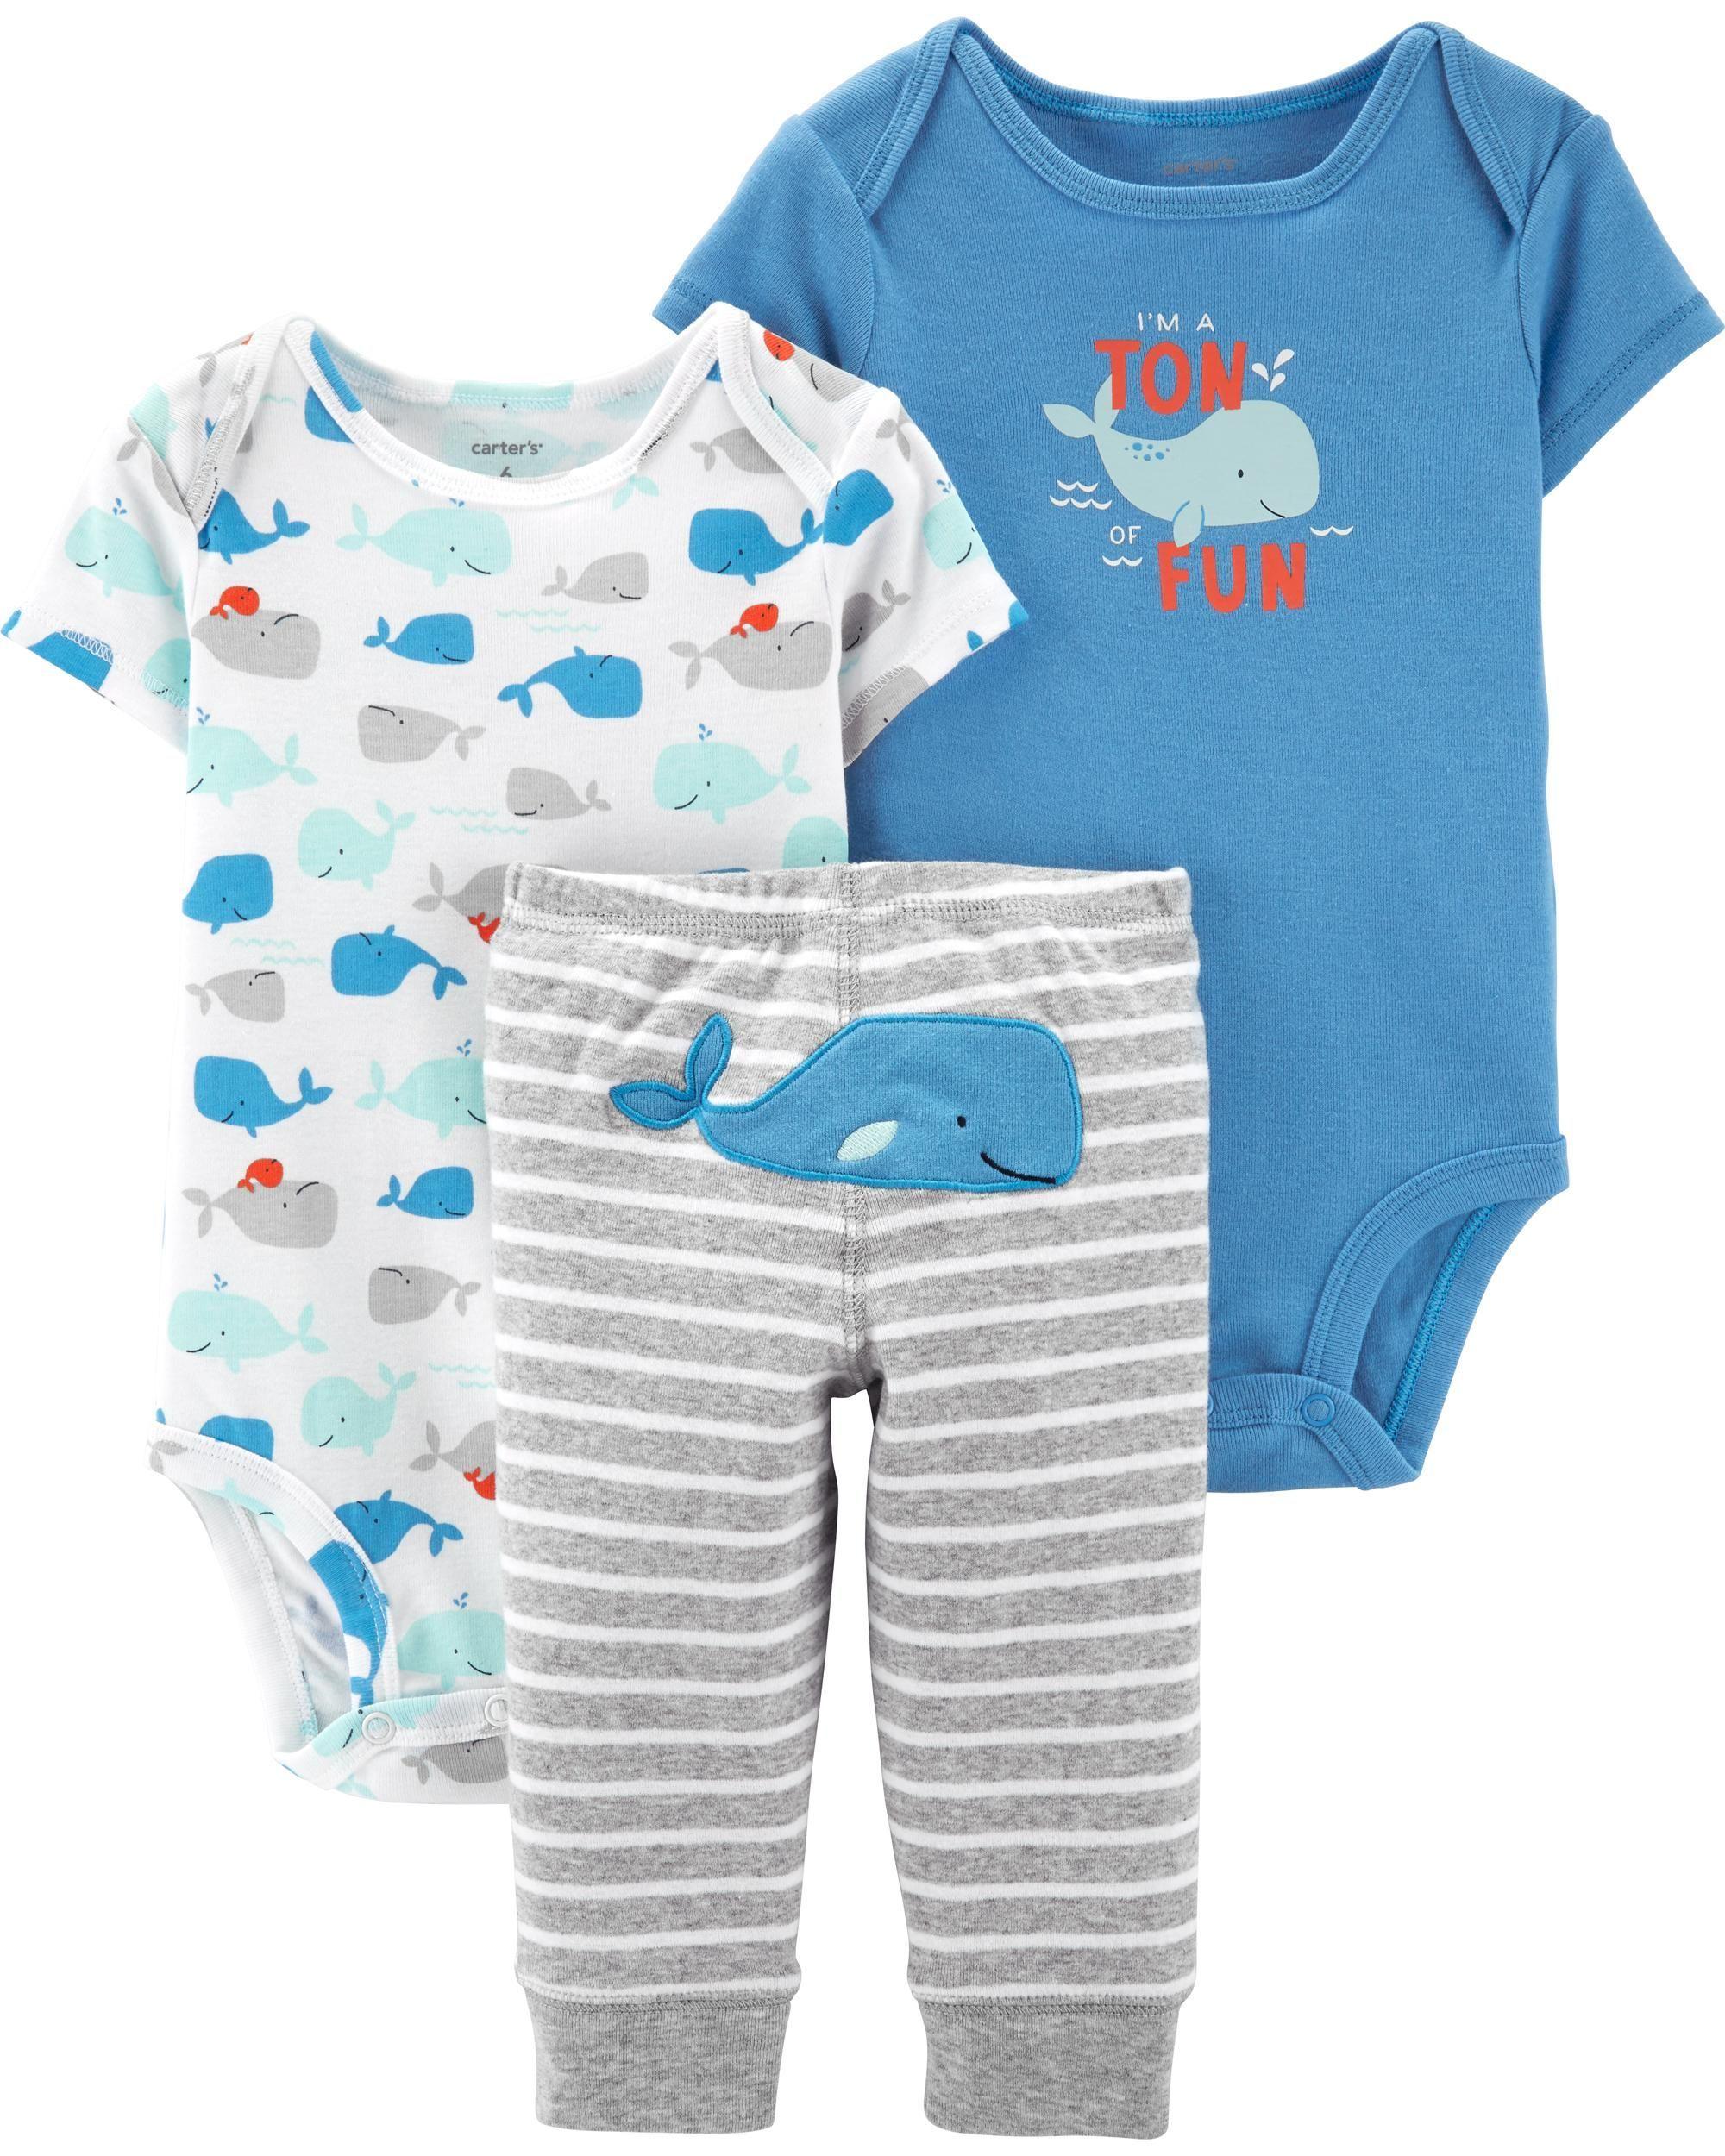 Carters 3 Piece Diaper Set Newborn 9 12 18 or 24 Months Baby Girl